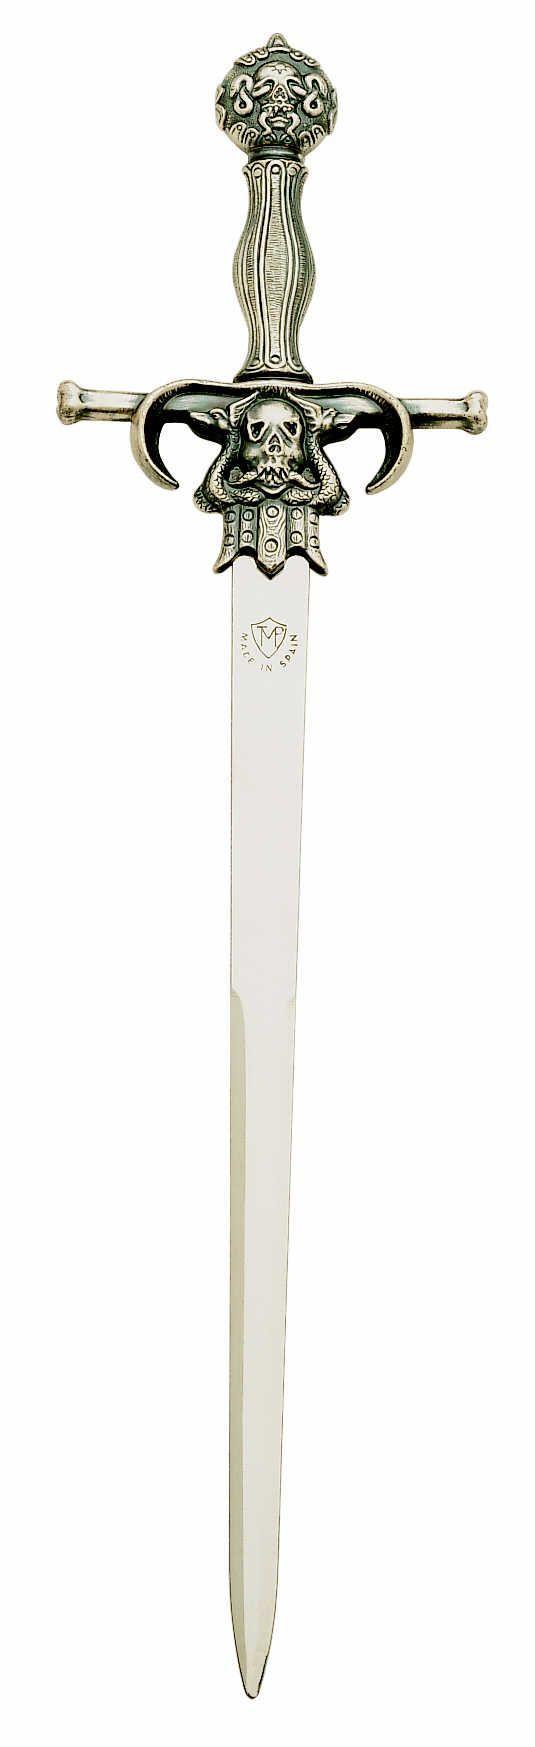 # 8260 Death Angel Sword Letter Opener by Marto of Toledo Spain